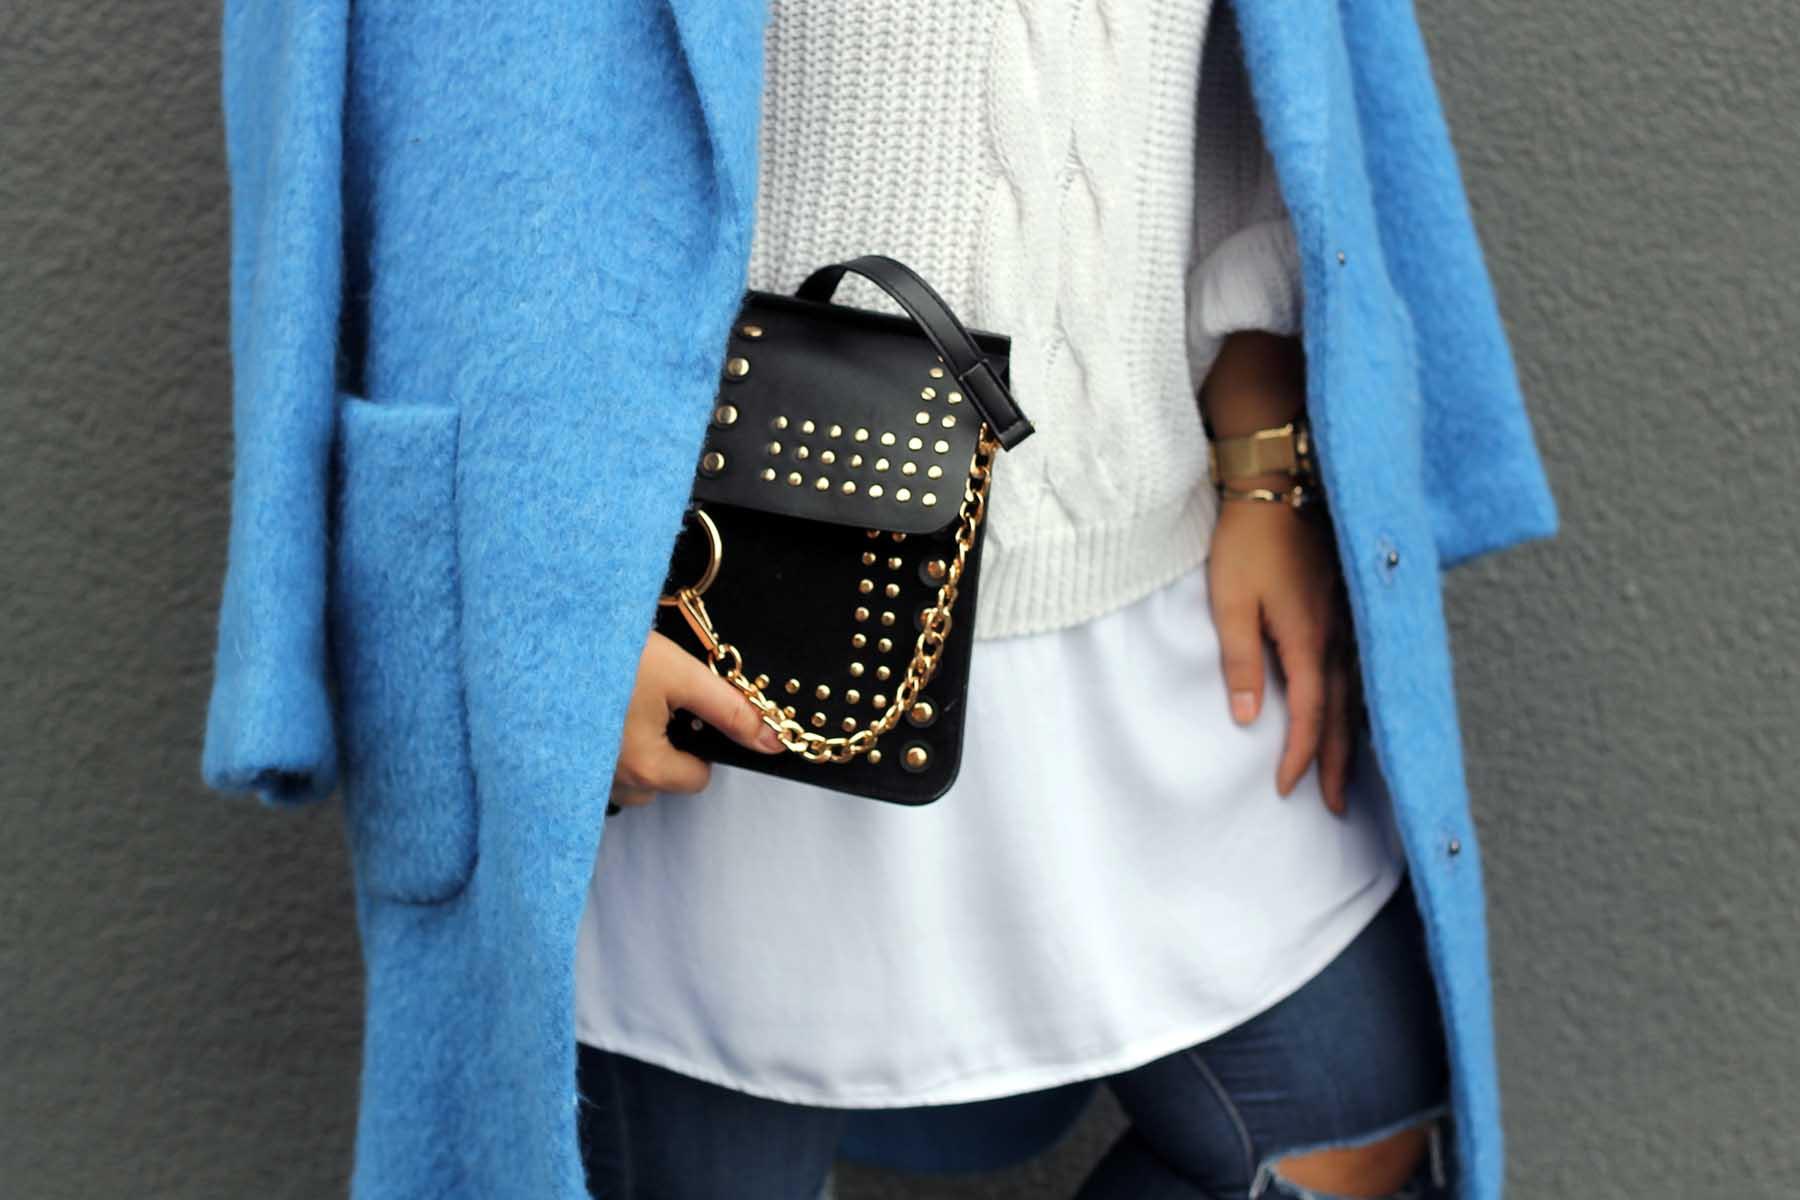 outfit-look-style-modeblog-fashionblog-blauer-mantel-jeans-balenciaga-lookalike-boots-chloe19